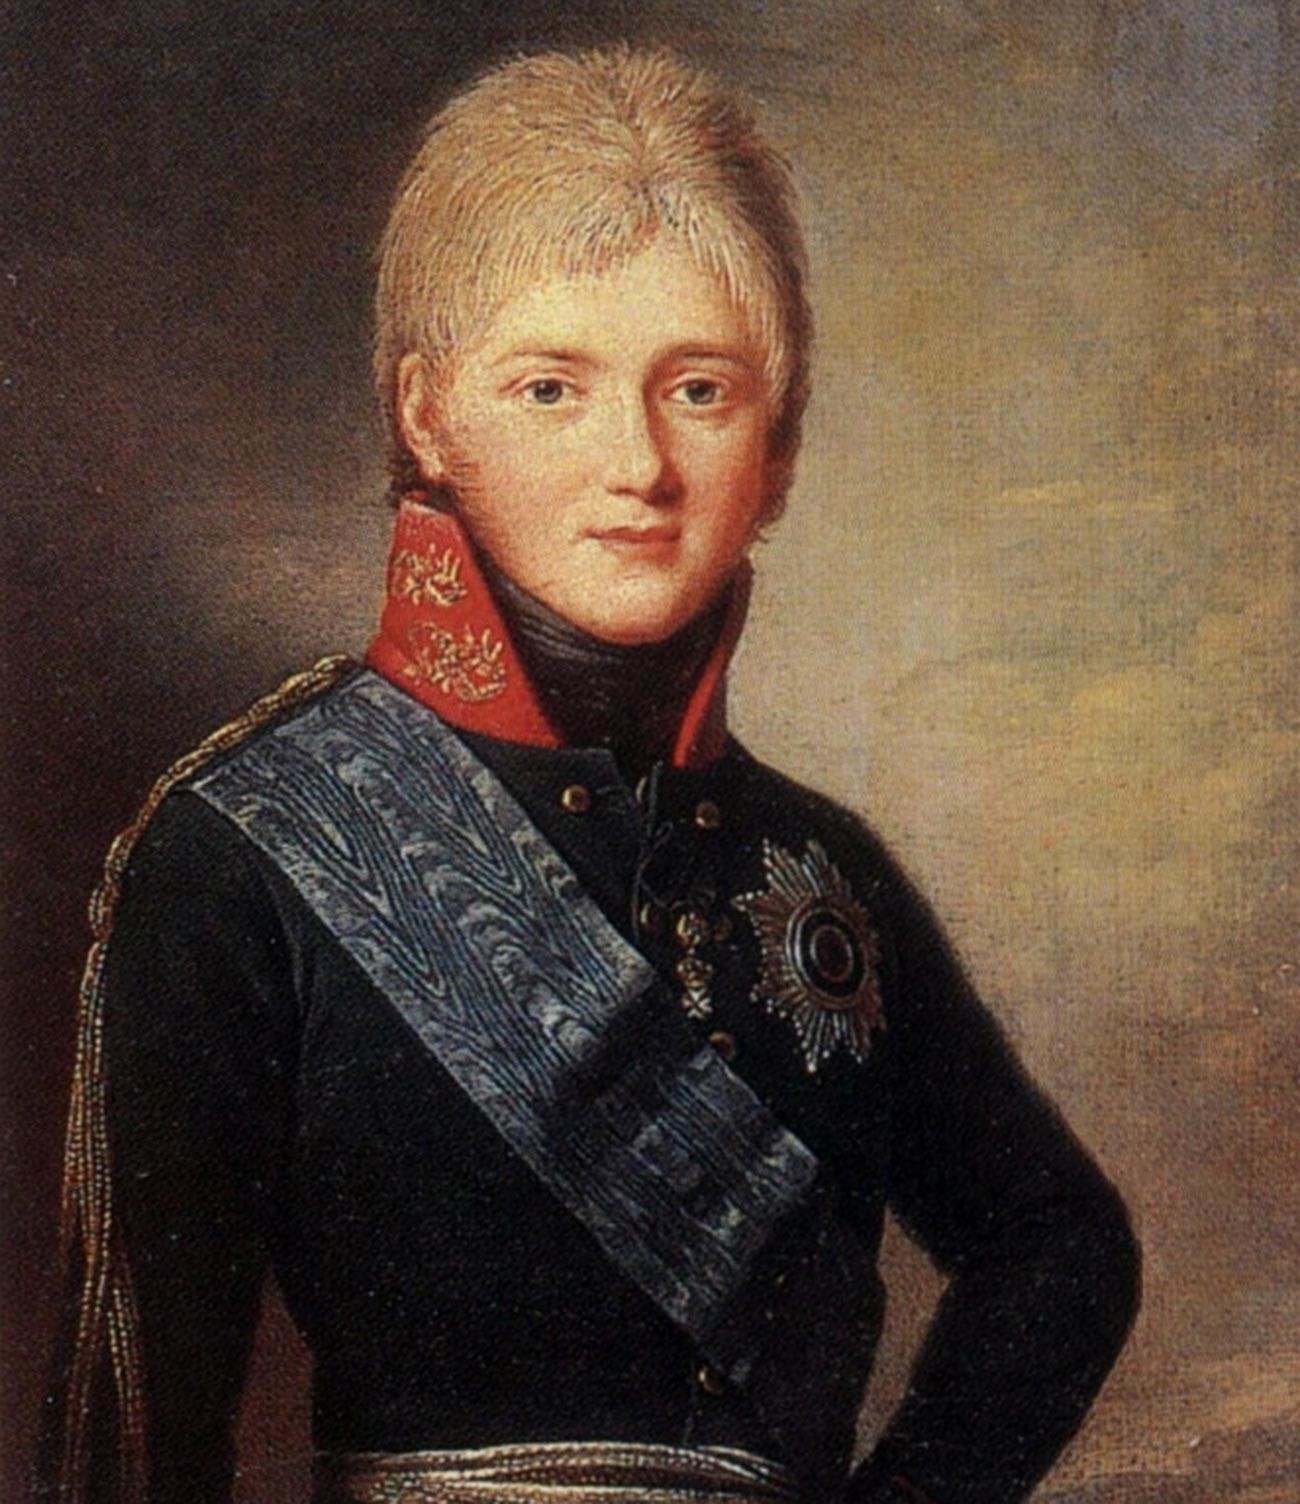 Портрет великог кнеза Александра Павловича, будућег императора Александра I.